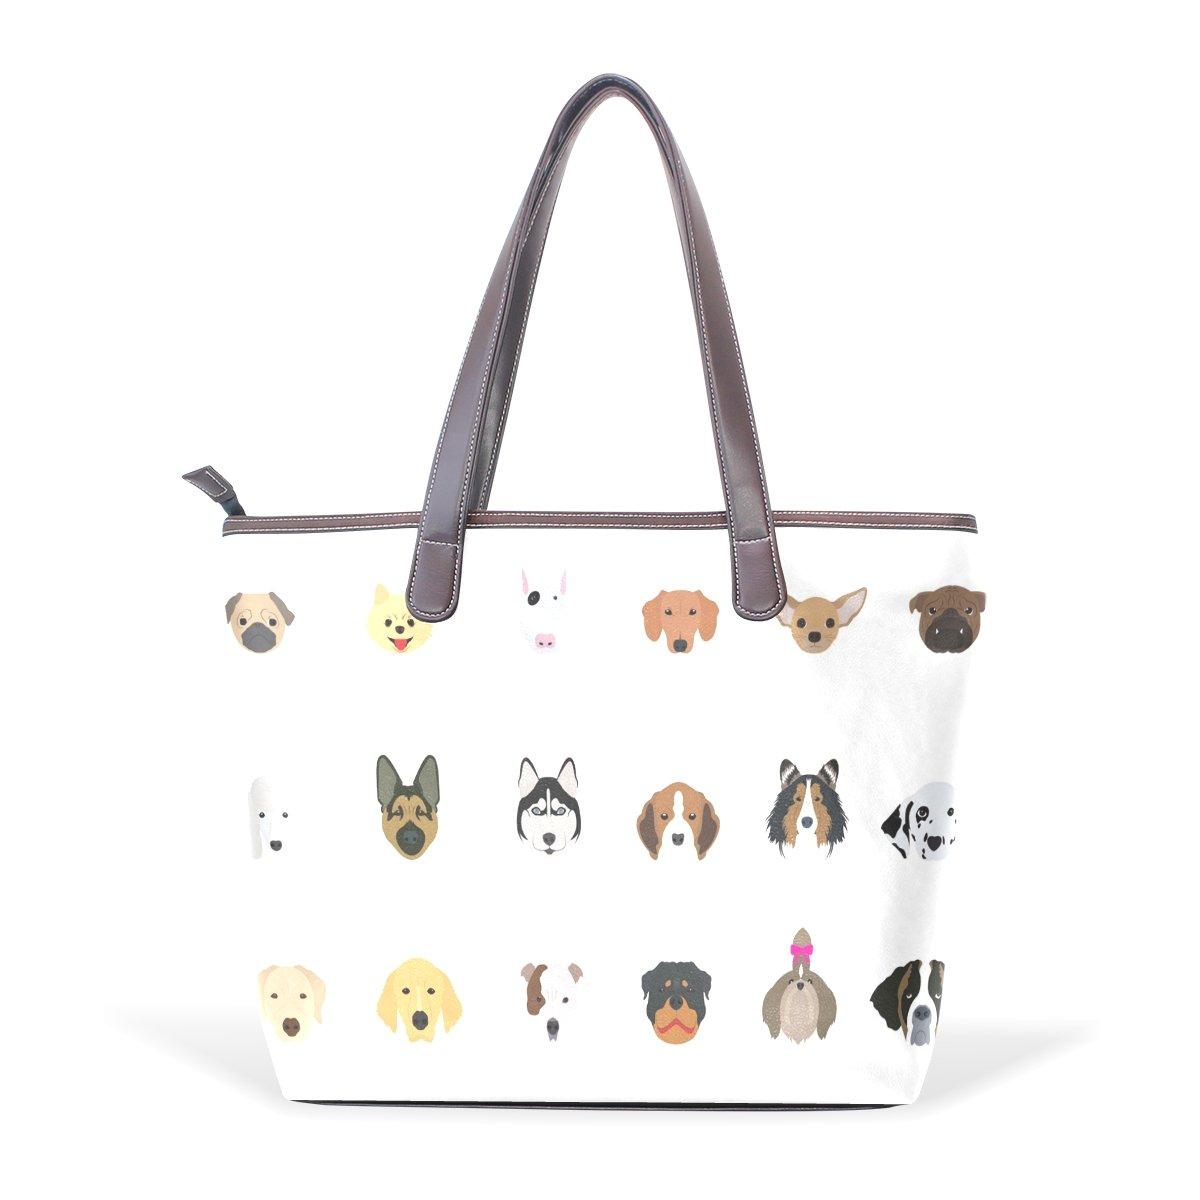 Ye Store Animal Paradise Lady PU Leather Handbag Tote Bag Shoulder Bag Shopping Bag